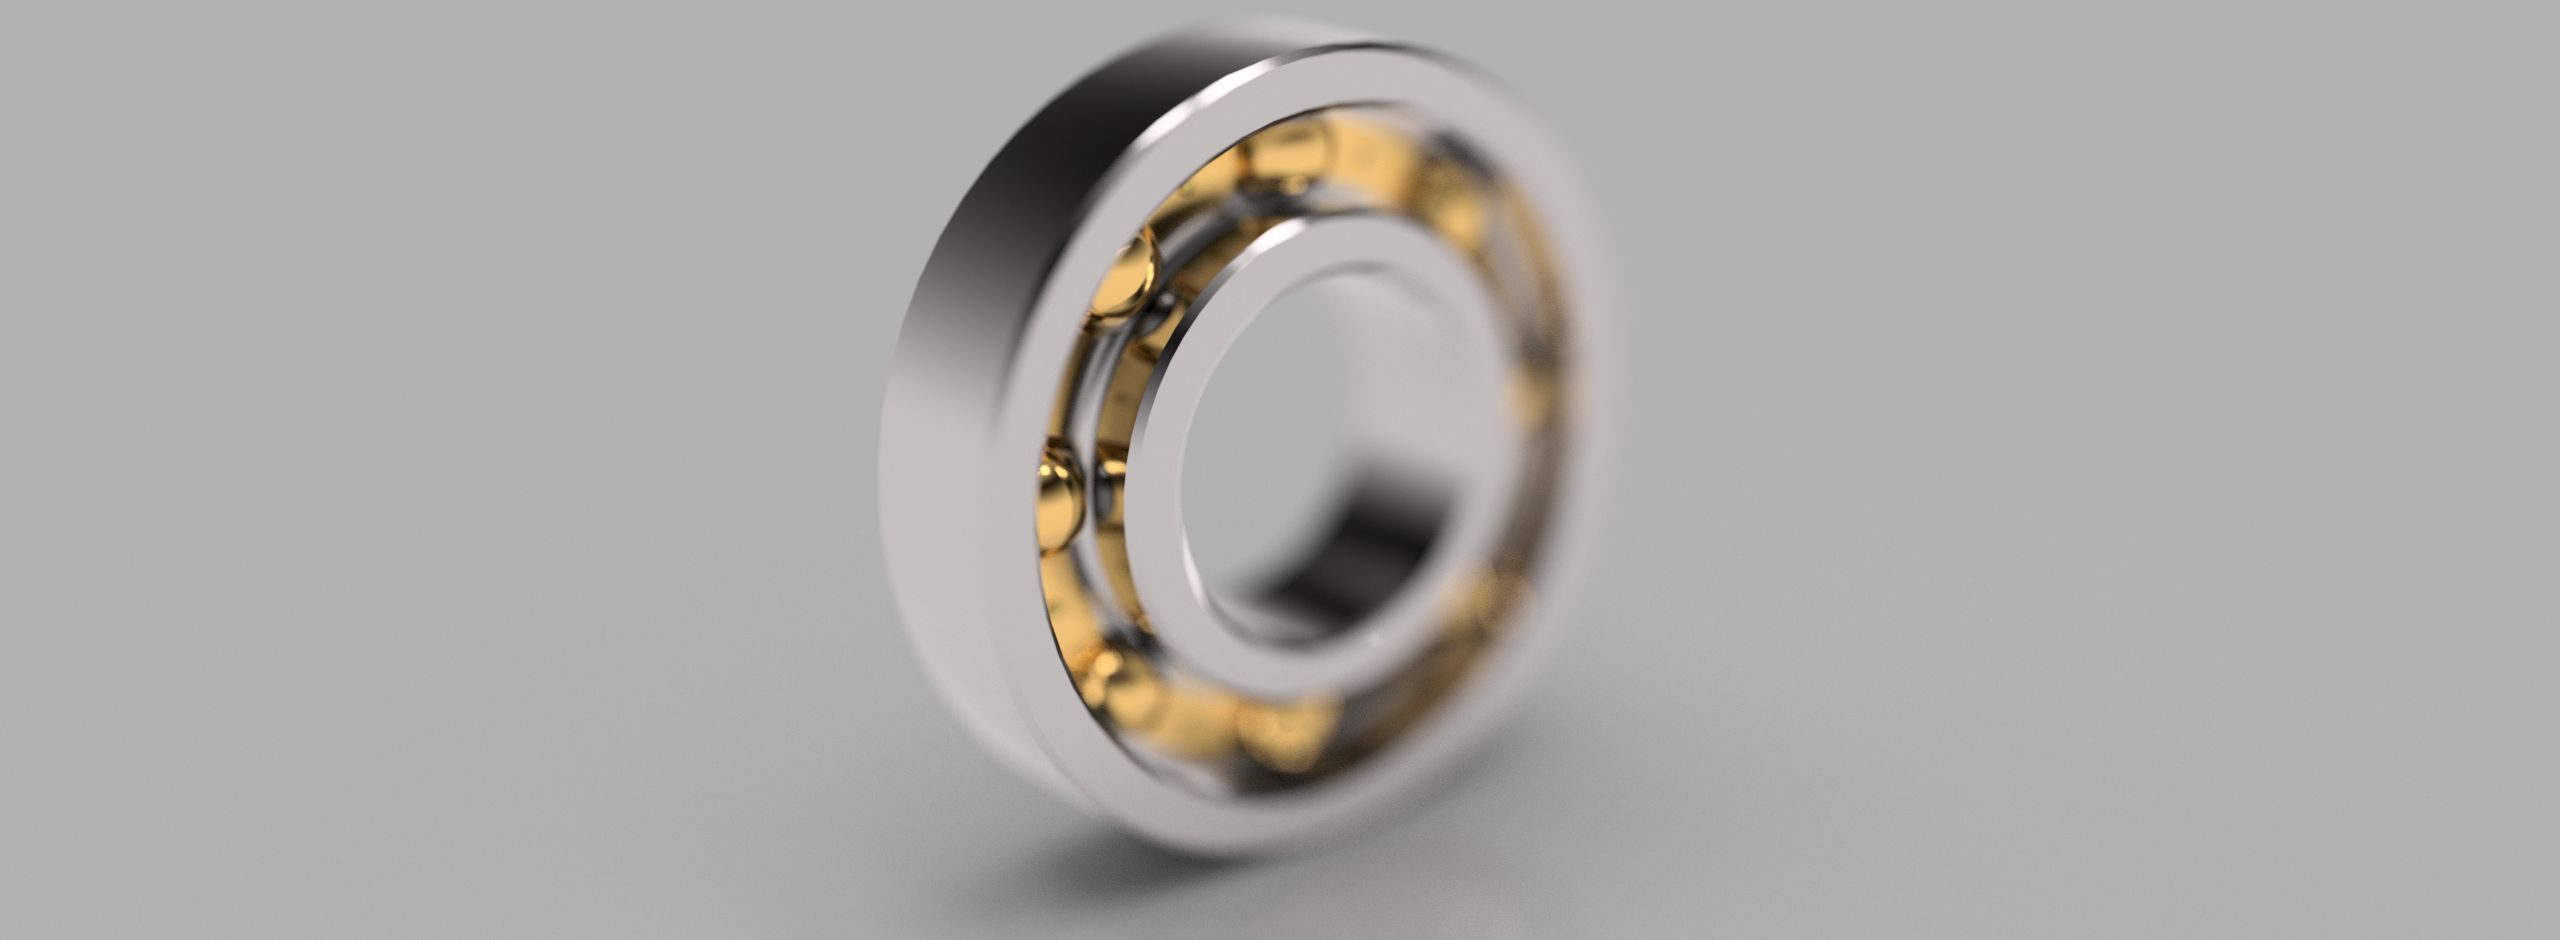 Ball-bearing-v2-3500-3500